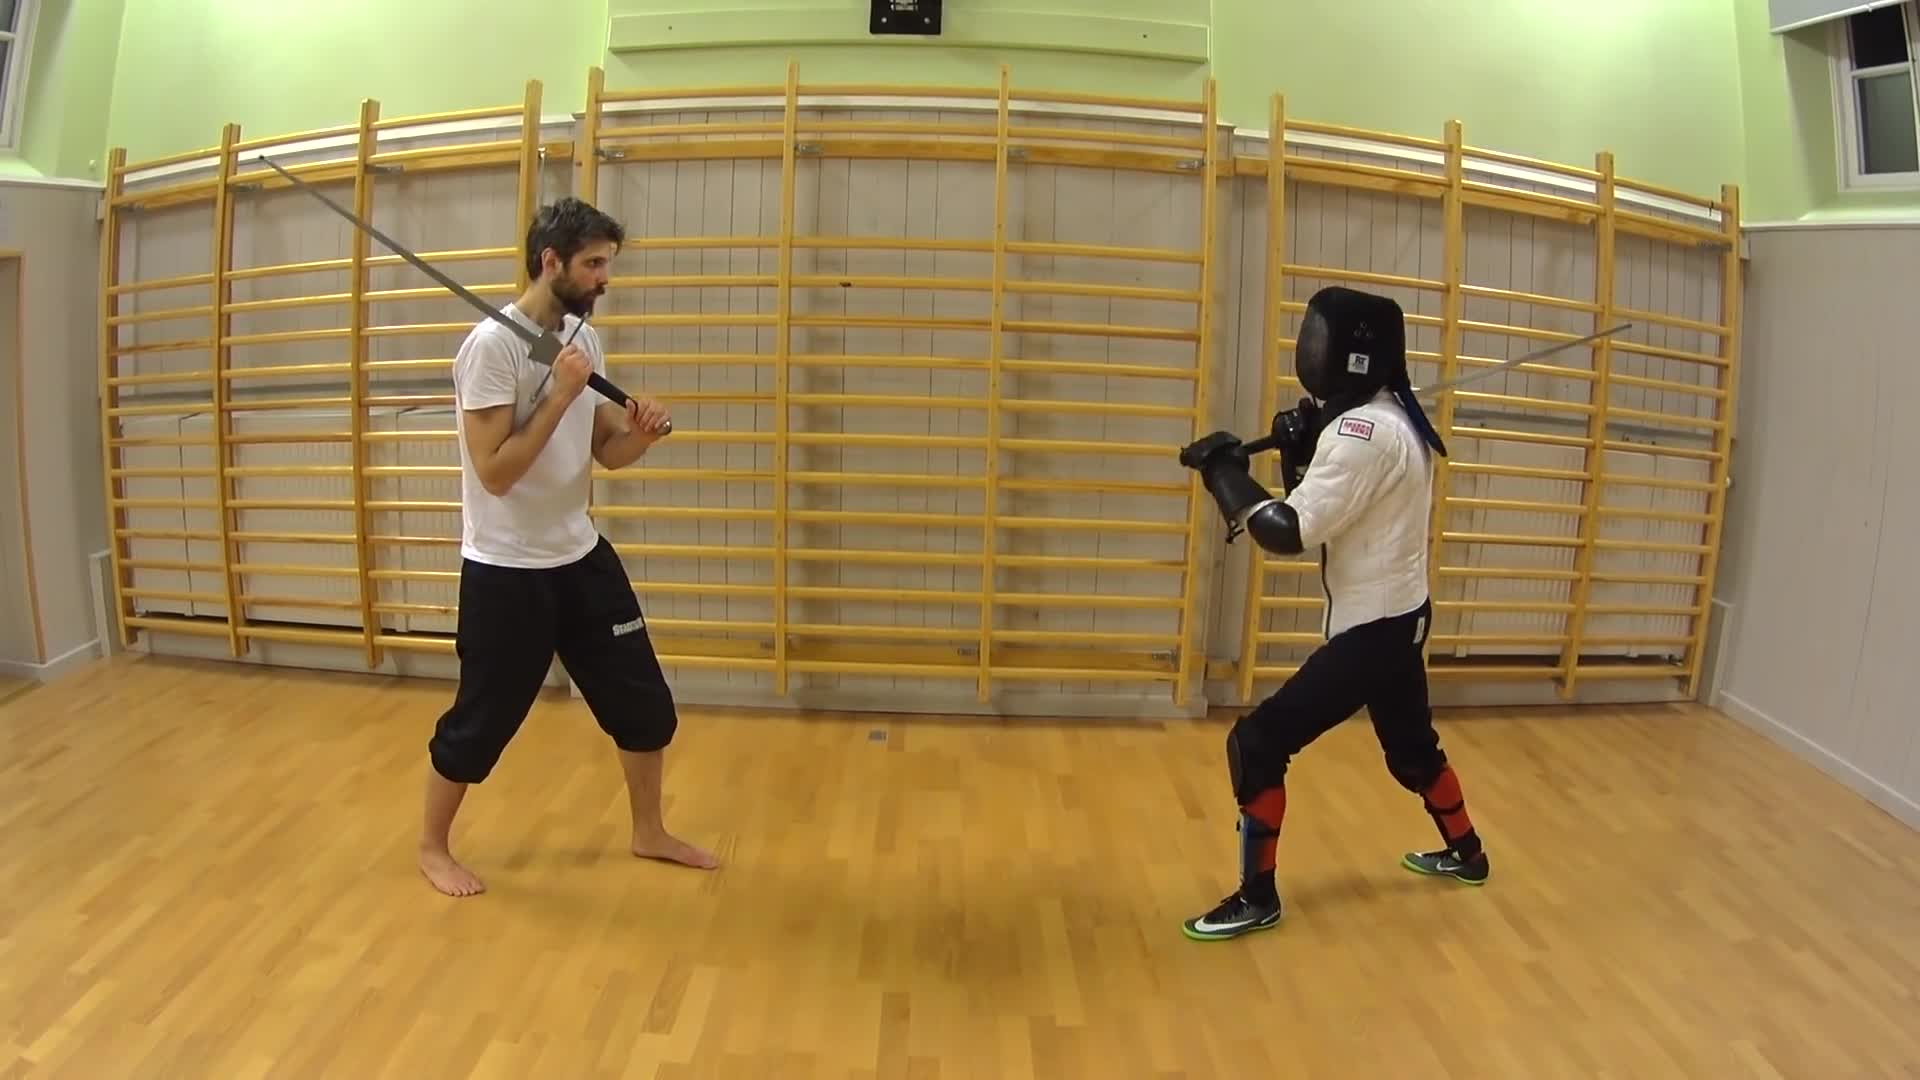 Carl Ryrberg, Gaming, HEMA, Historical European Martial Arts, Longsword, Tomten's History & Simulation, WMA, Western Martial Arts, Örebro HEMA, Carl Ryrberg basic parry GIFs